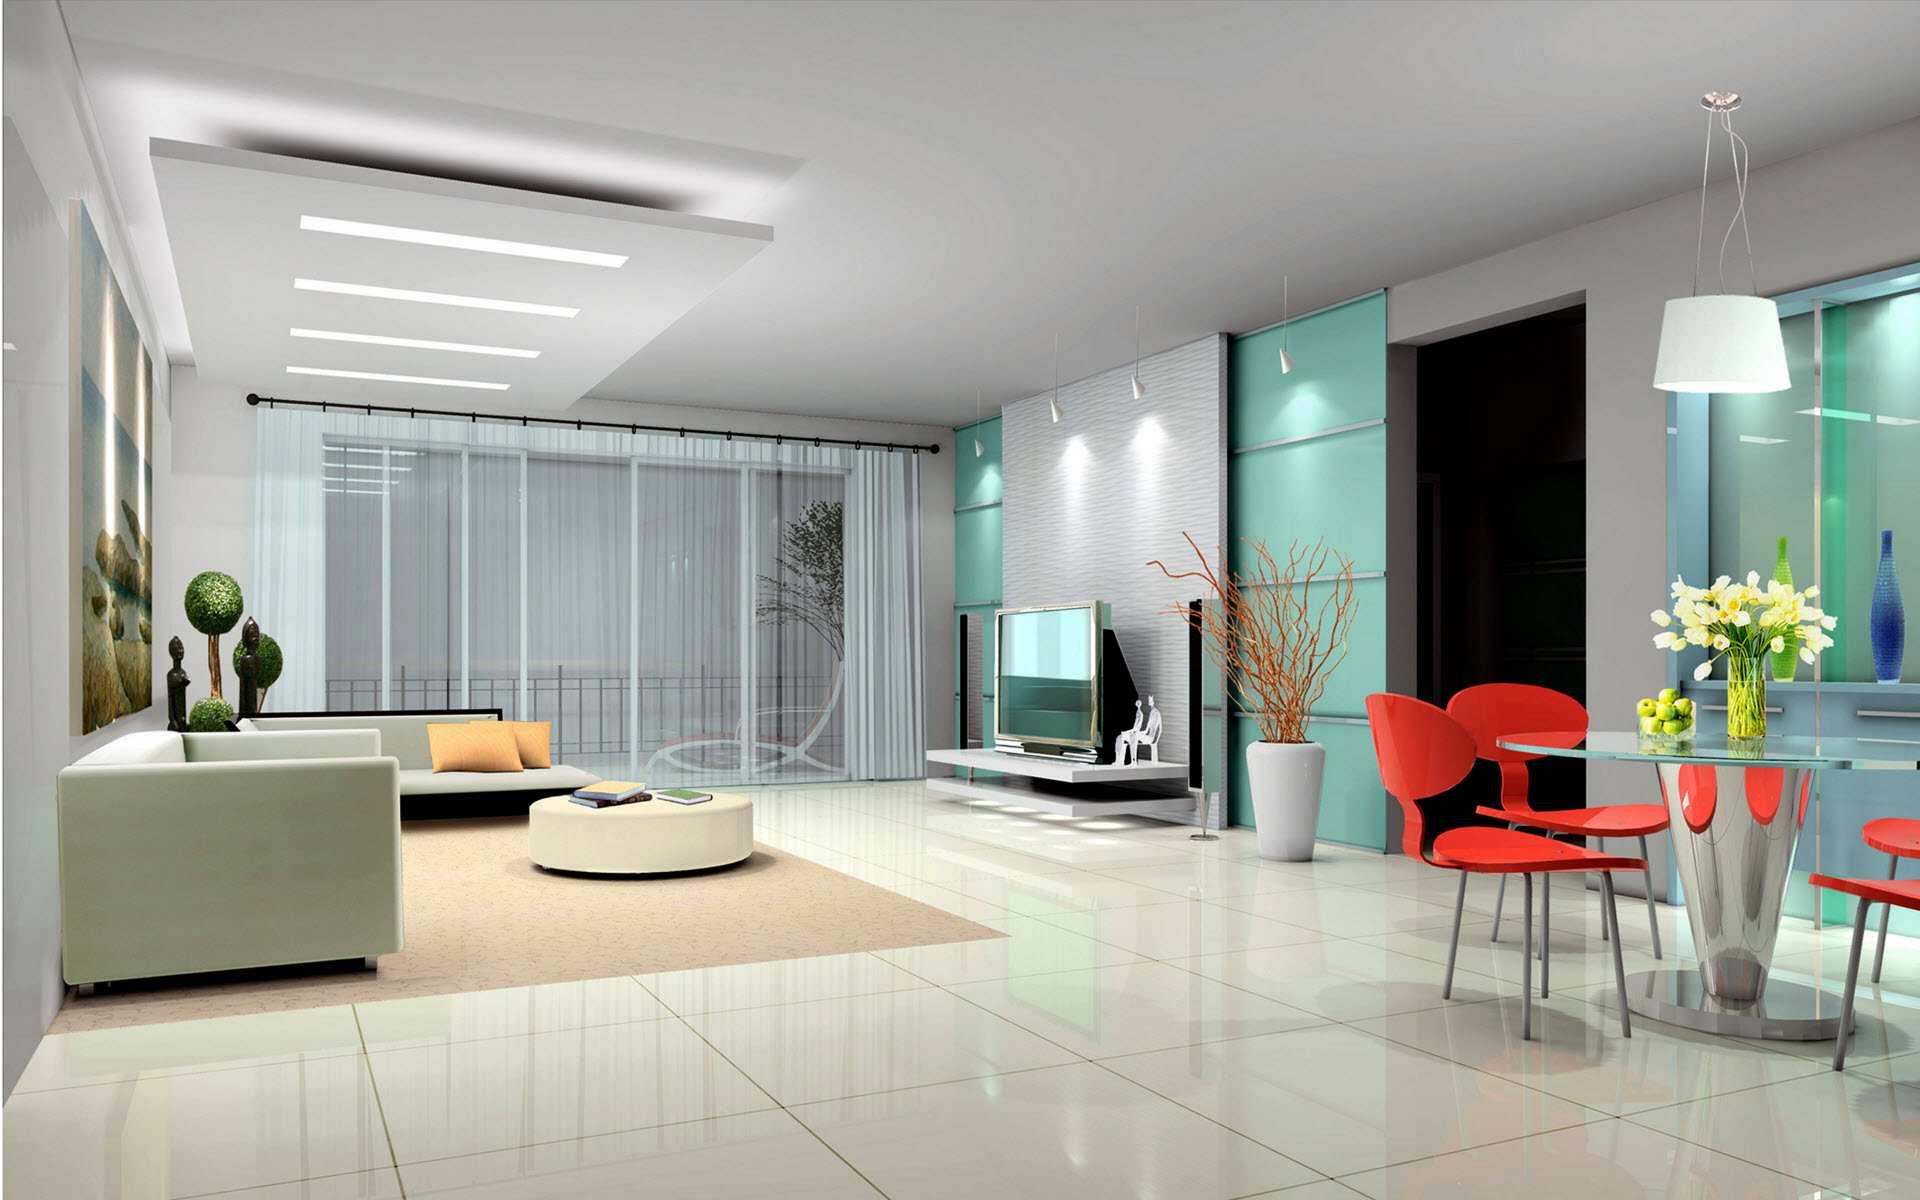 Interior Design Ideas Video Amazon De Apps Fur Android